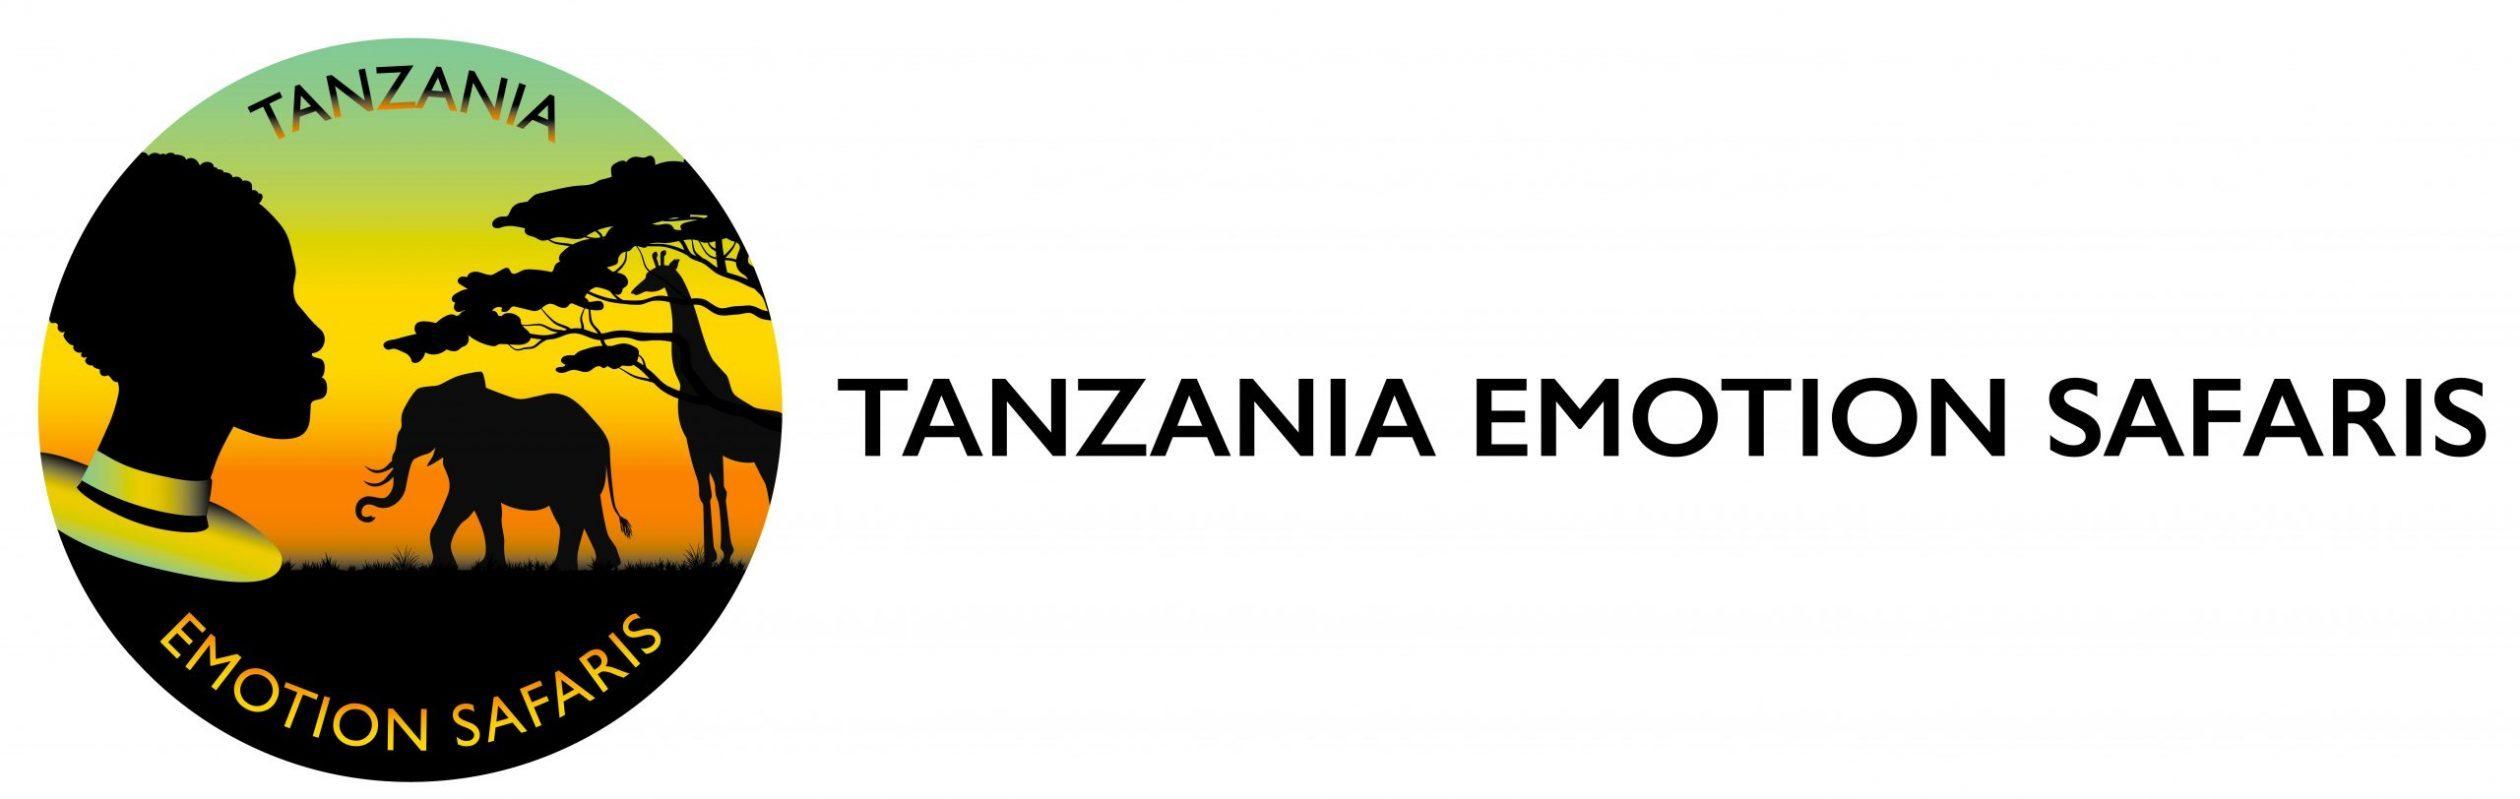 Tanzania Emotion Safaris